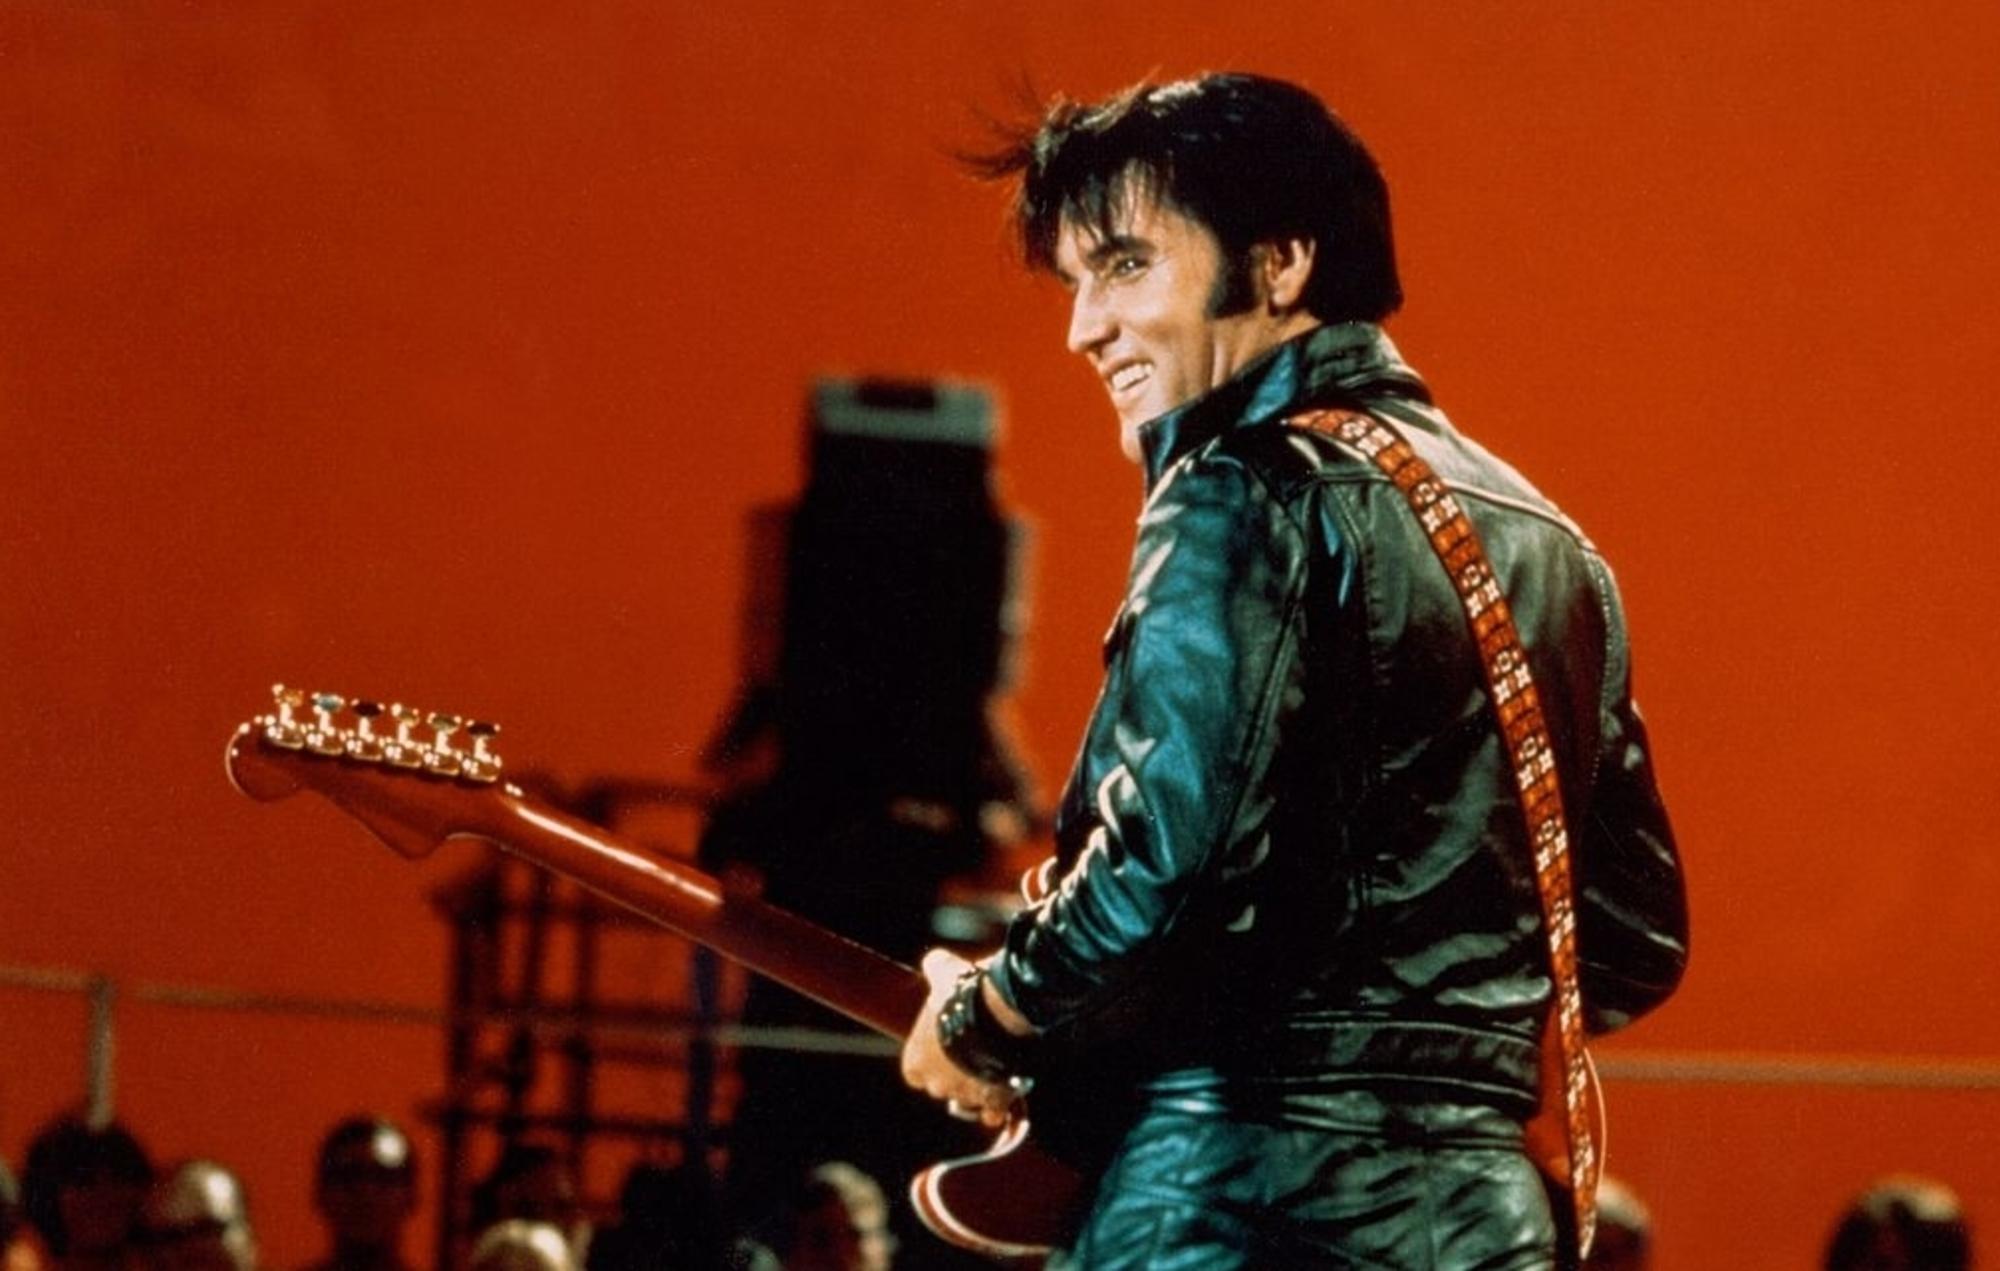 Elvis Presley biographer claims bad genes killed star, not rock'n'roll excess